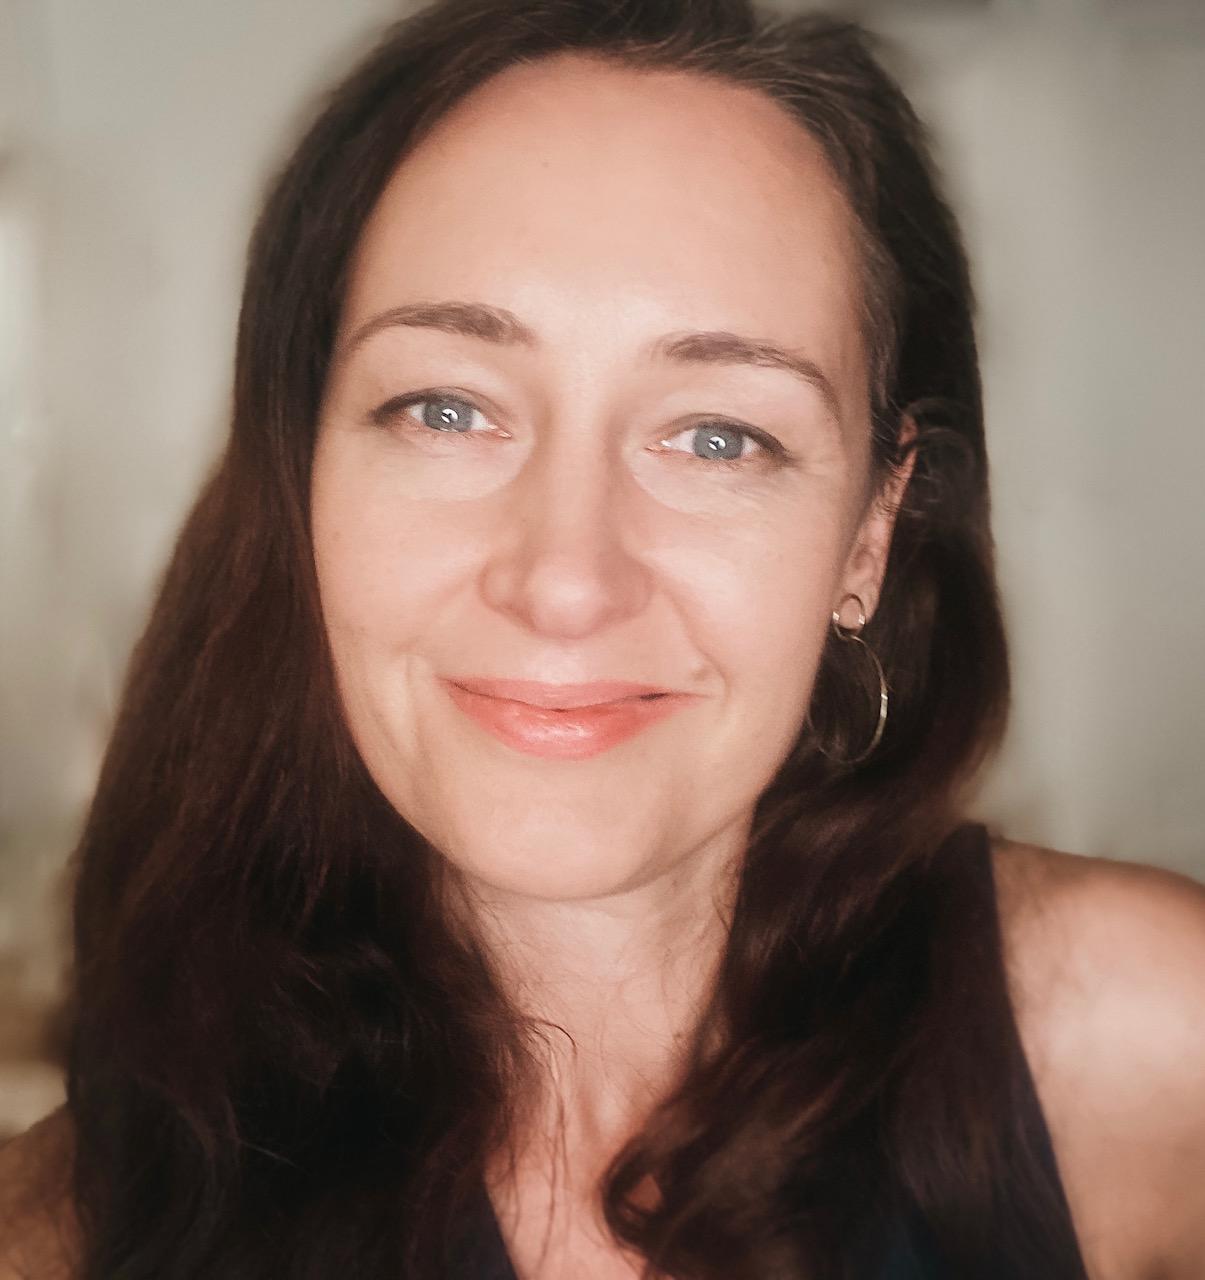 Geld Mindset. Vom Auflösen der Angst. Annica Vogt #679 https://tomstalktime.com/